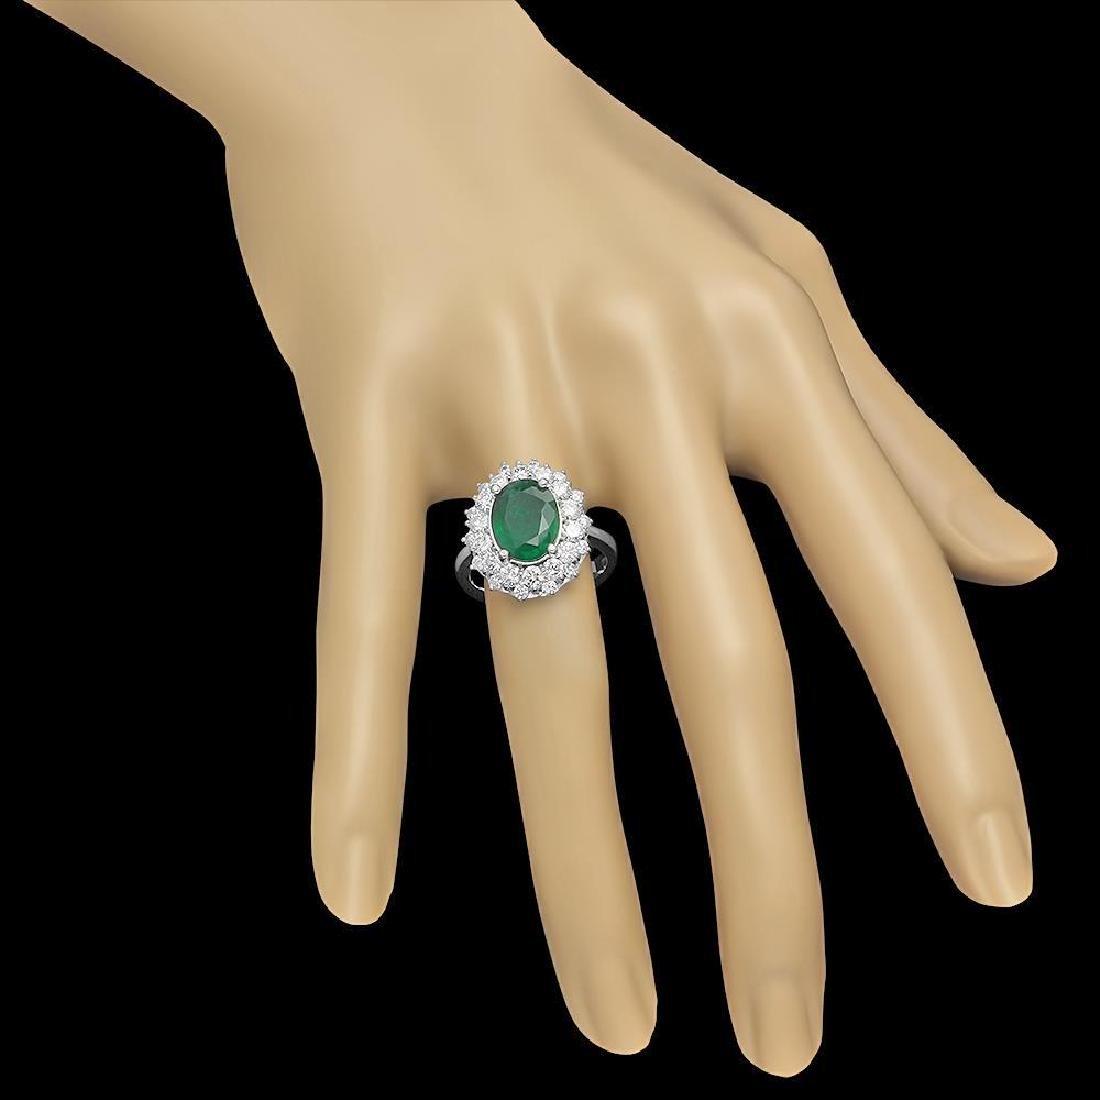 14K Gold 2.08ct Emerald 1.59ct Diamond Ring - 3